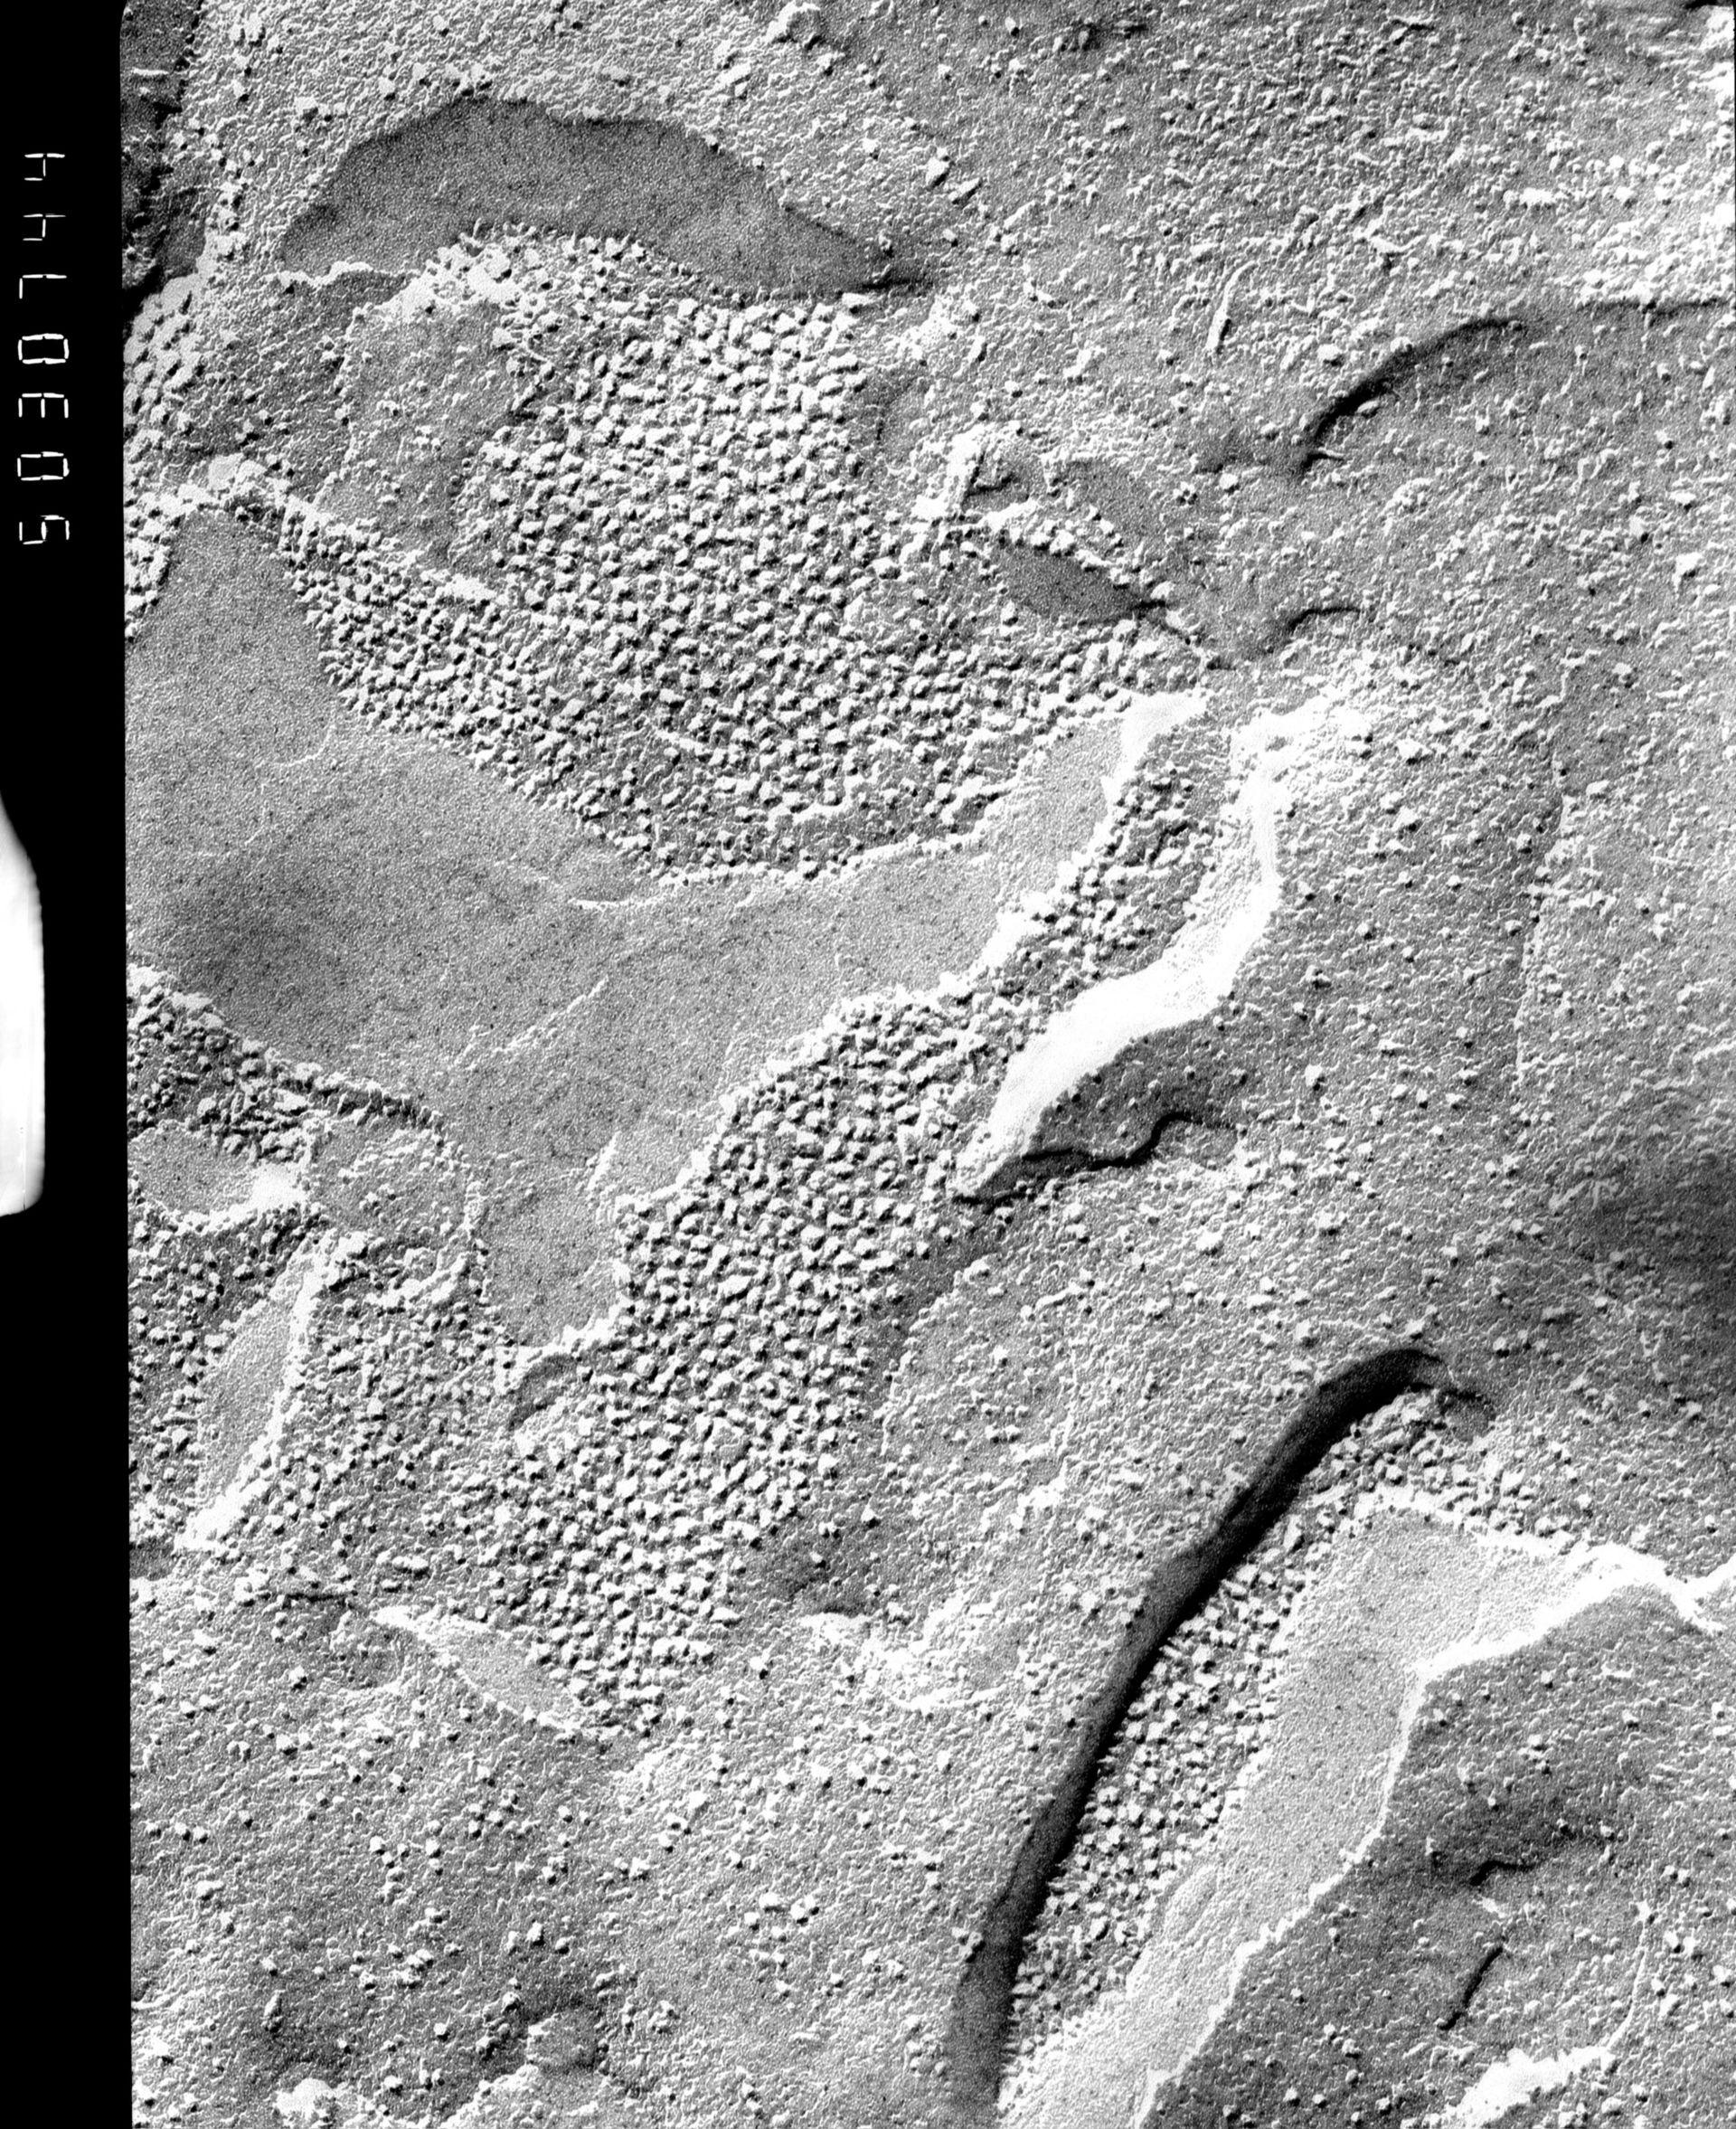 Prochloron (Thylakoid) - CIL:13860